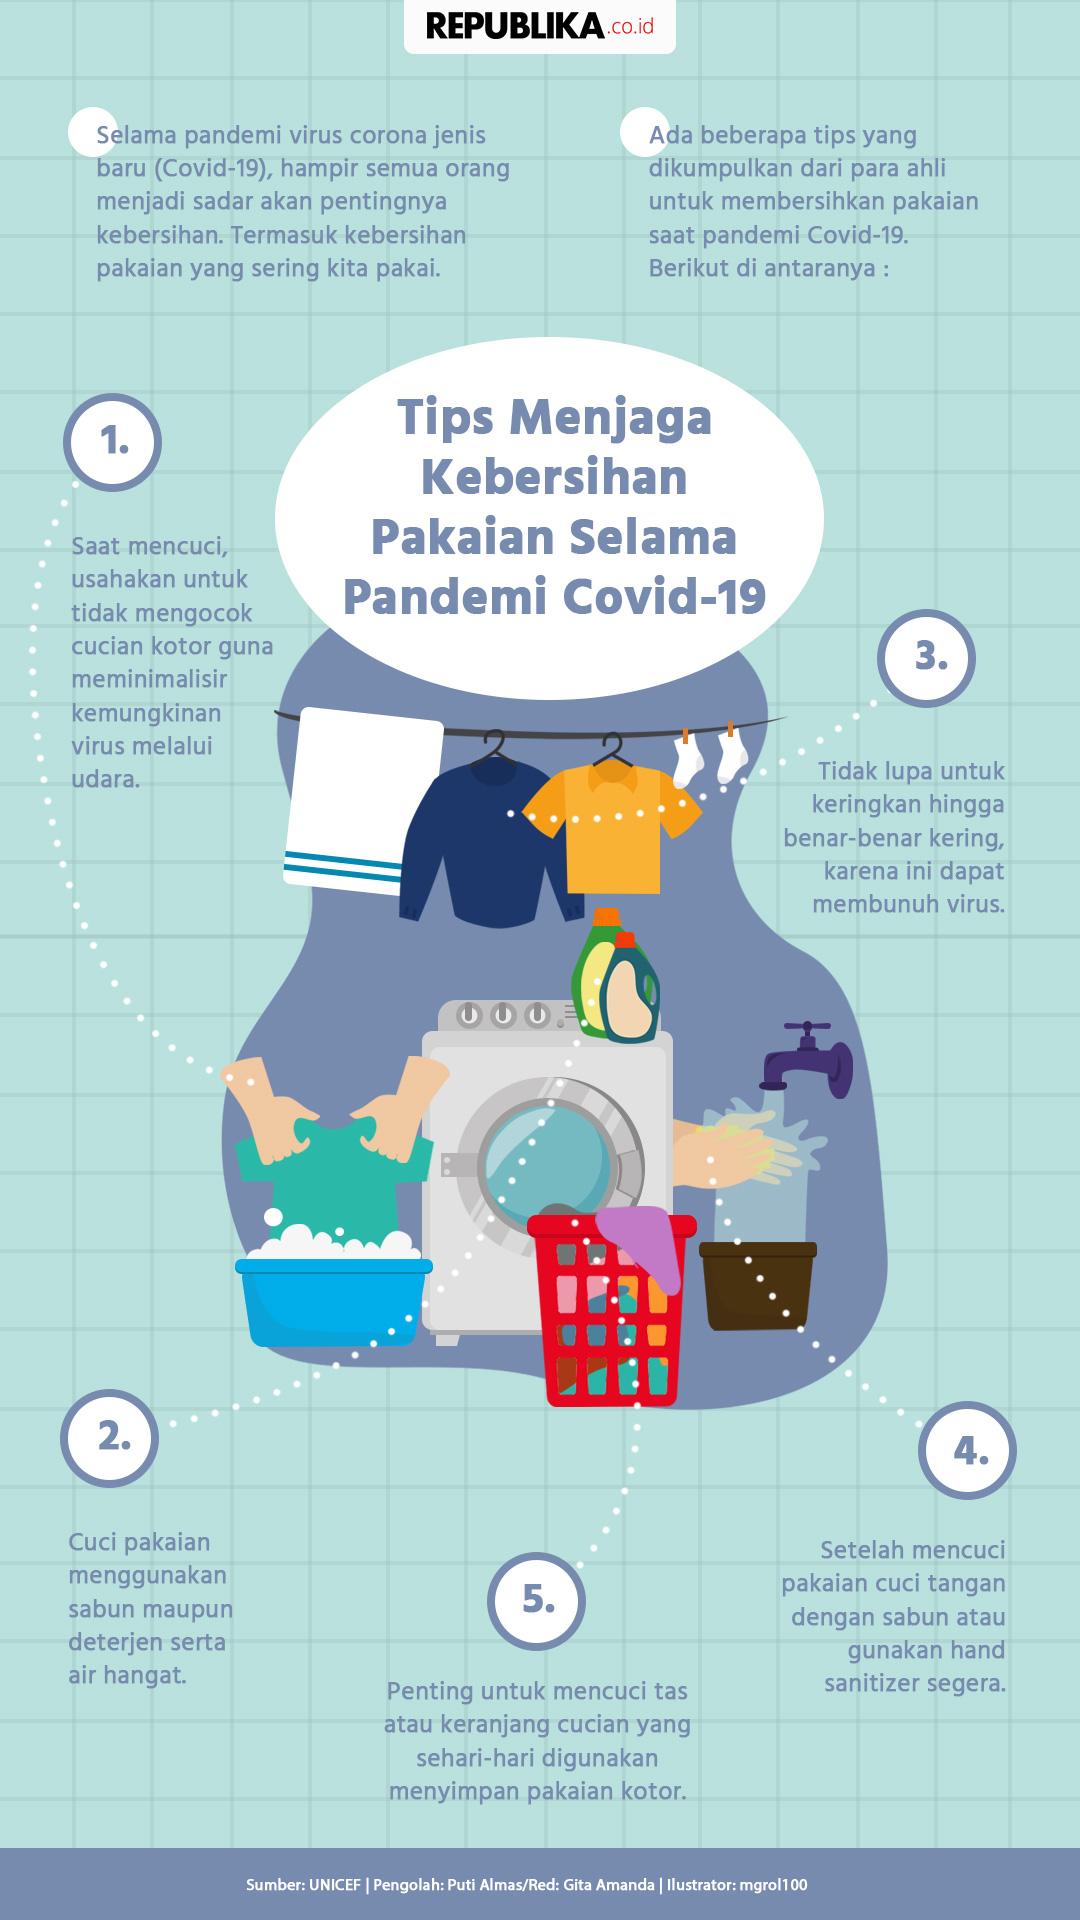 Tips Menjaga Kebersihan Pakaian Selama Pandemi Covid 19 Republika Online Cara mencuci pakaian yang benar